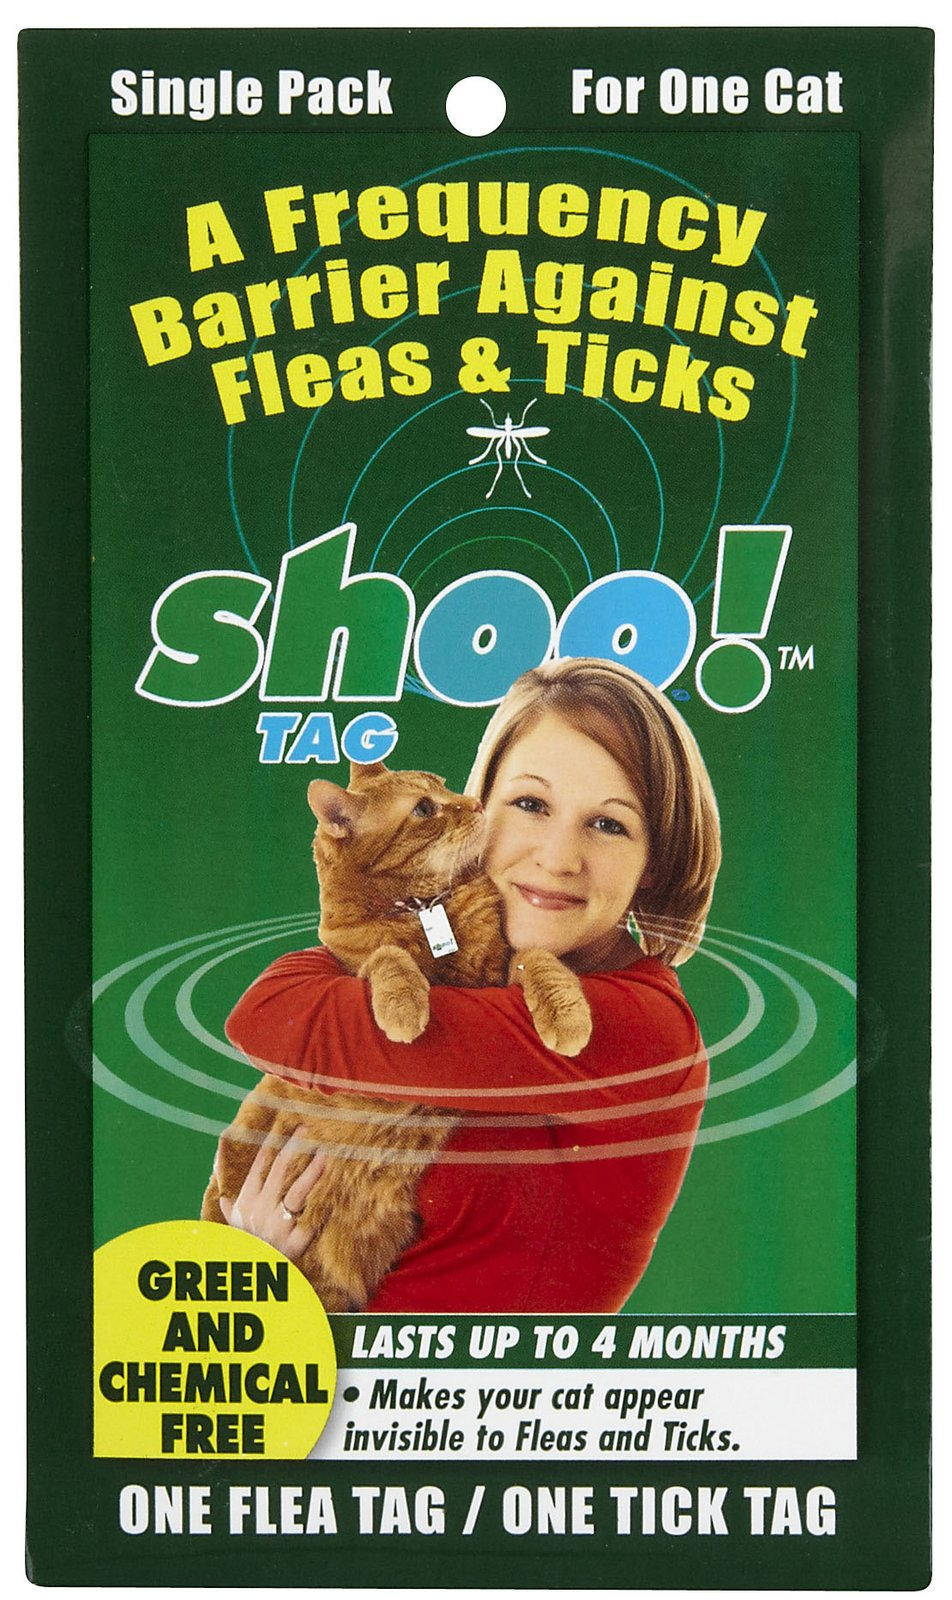 mickey 39 s pet supplies blog alternative to cat flea collar shoo tag for cats. Black Bedroom Furniture Sets. Home Design Ideas